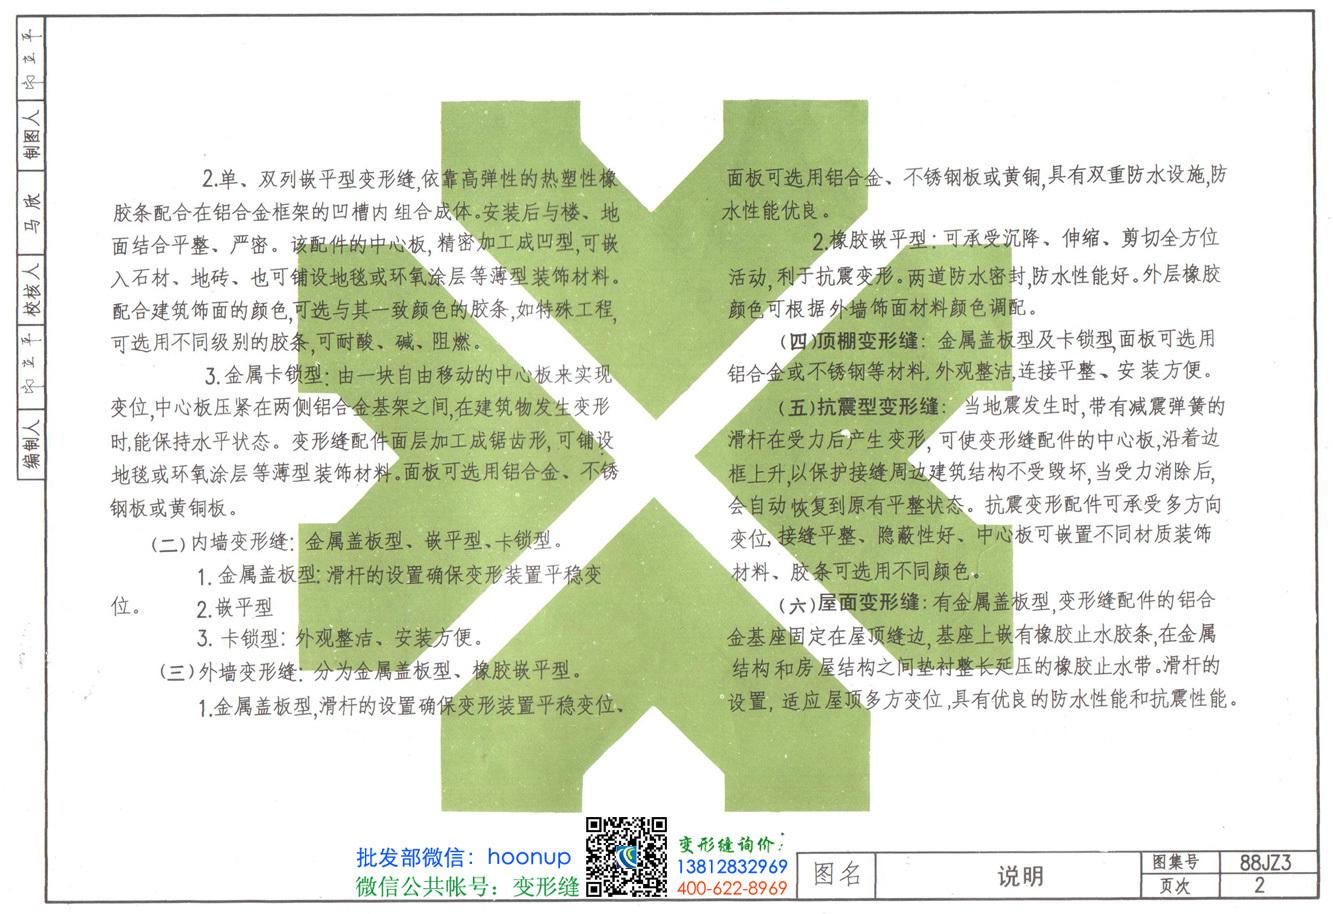 88JZ3变形缝图集第2页